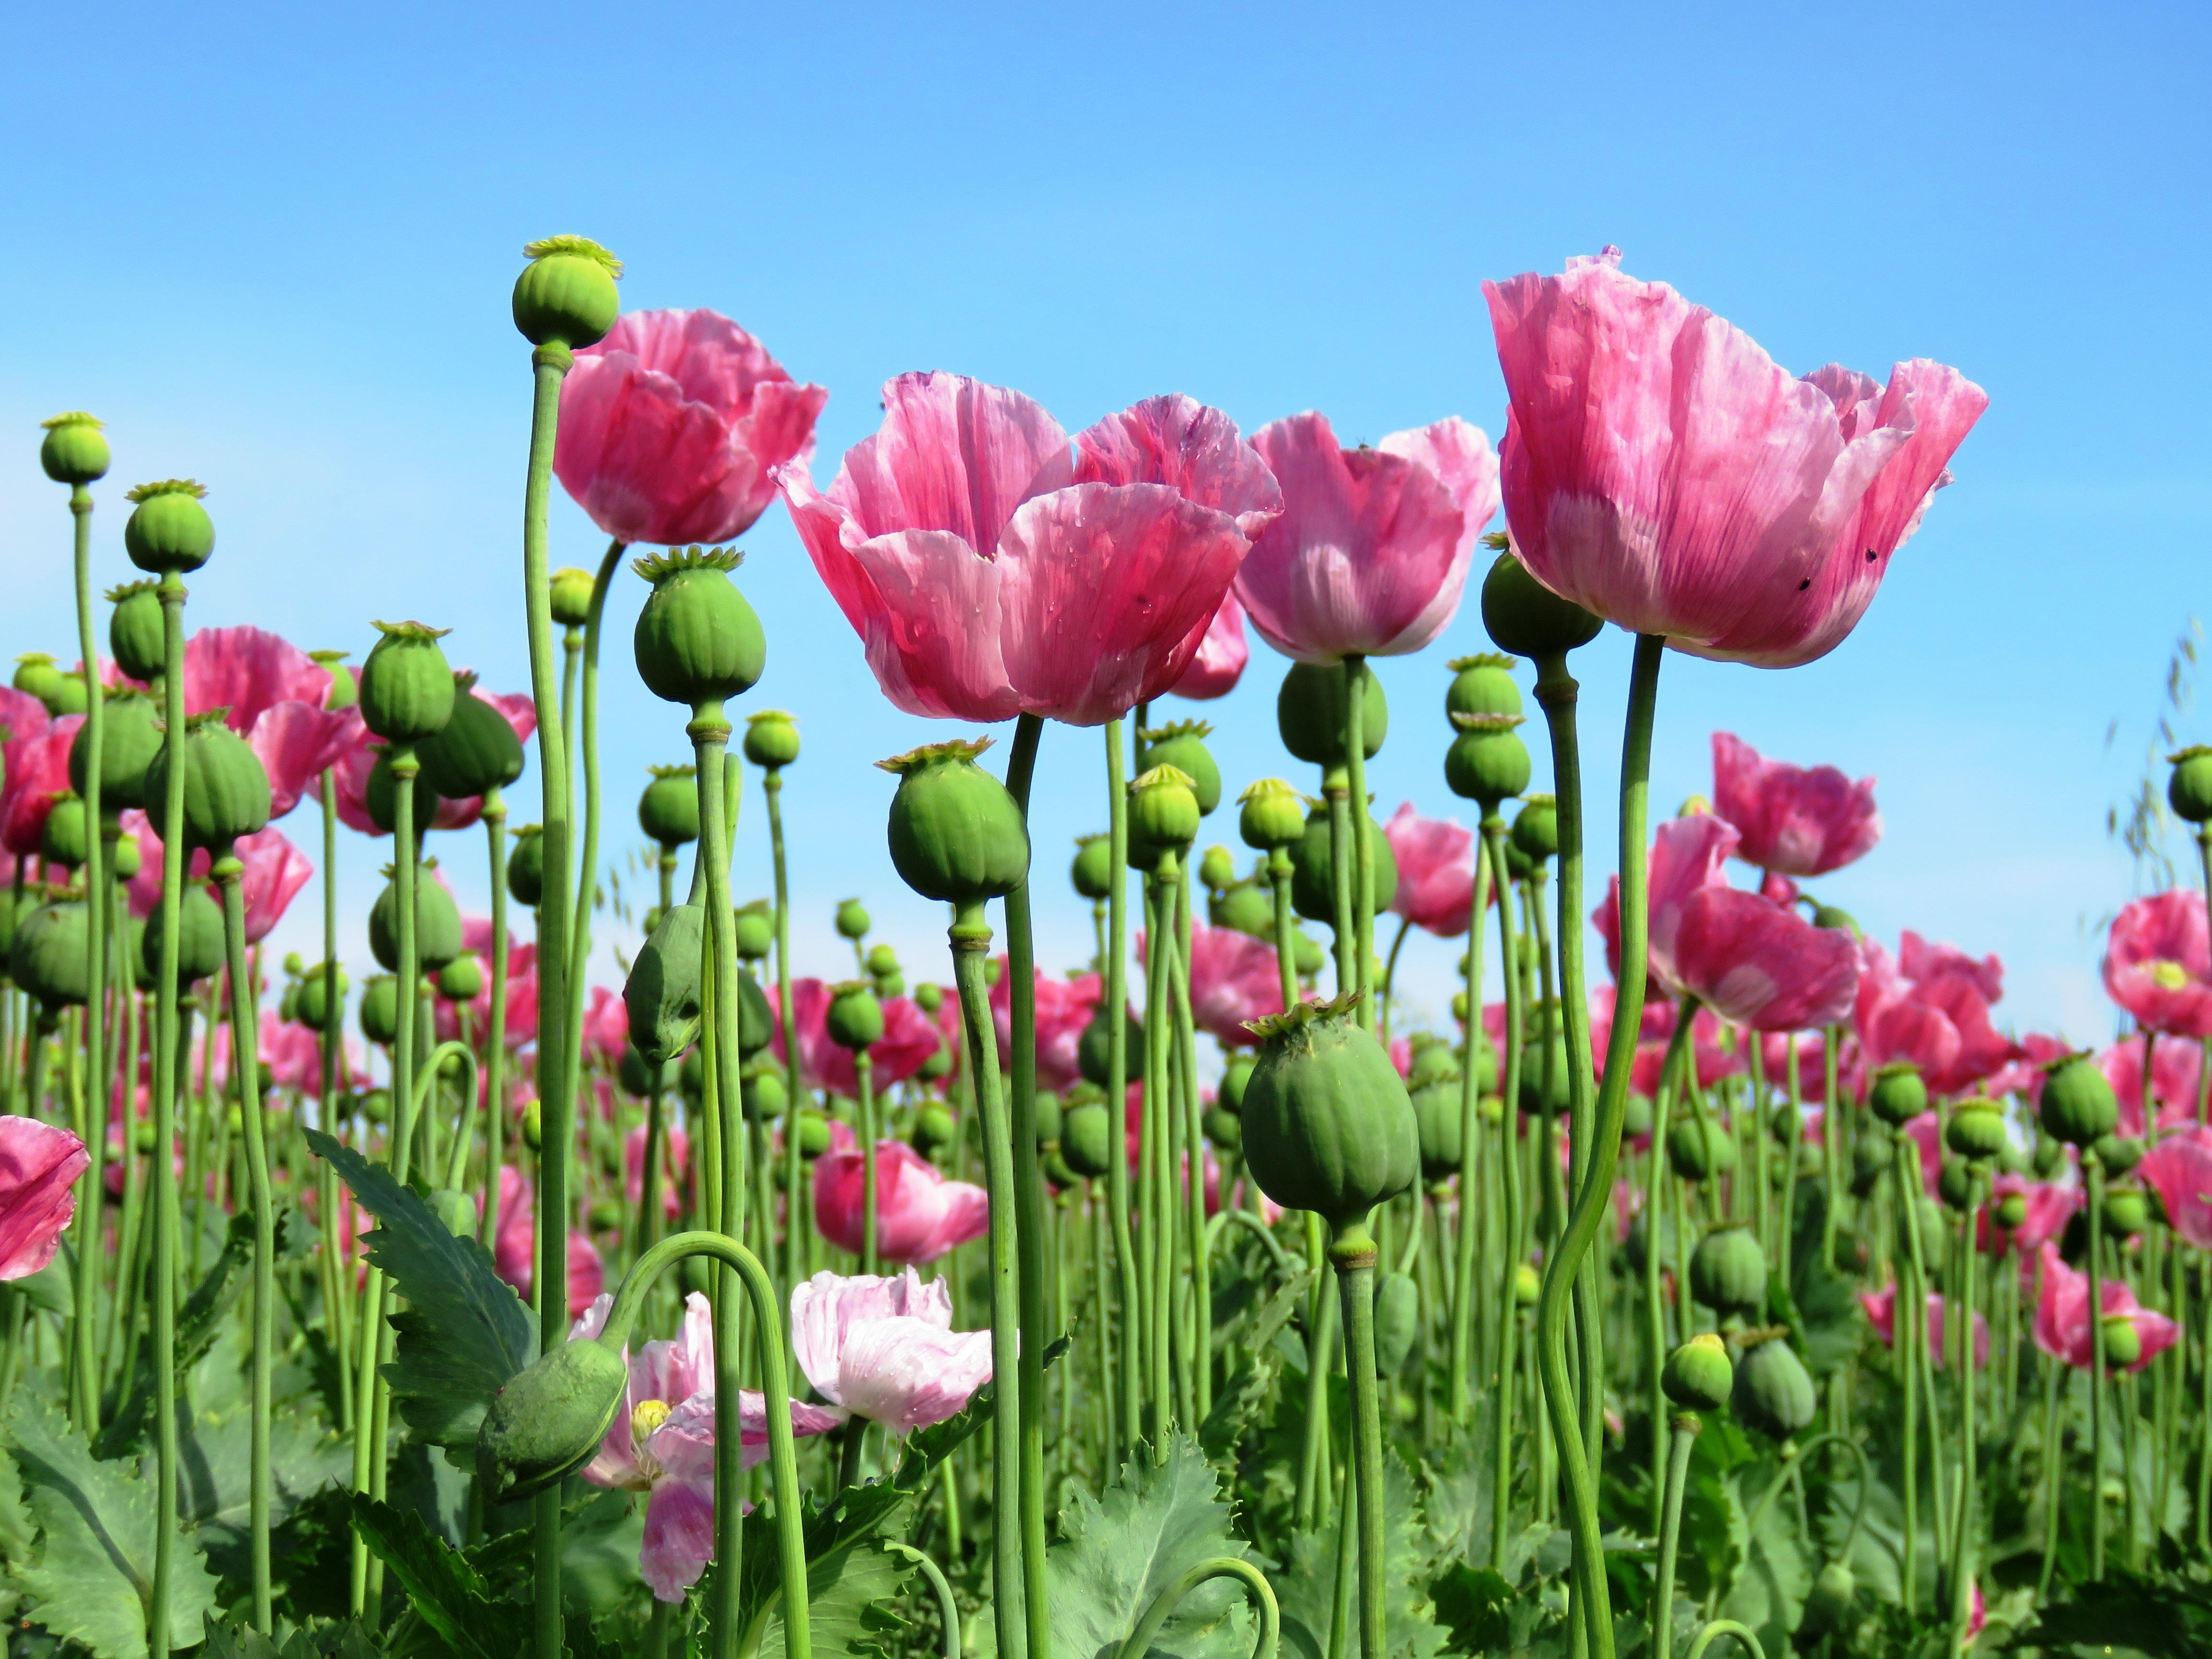 Free Images Petal Tulip Pink Poppy Flower Flowering Plant